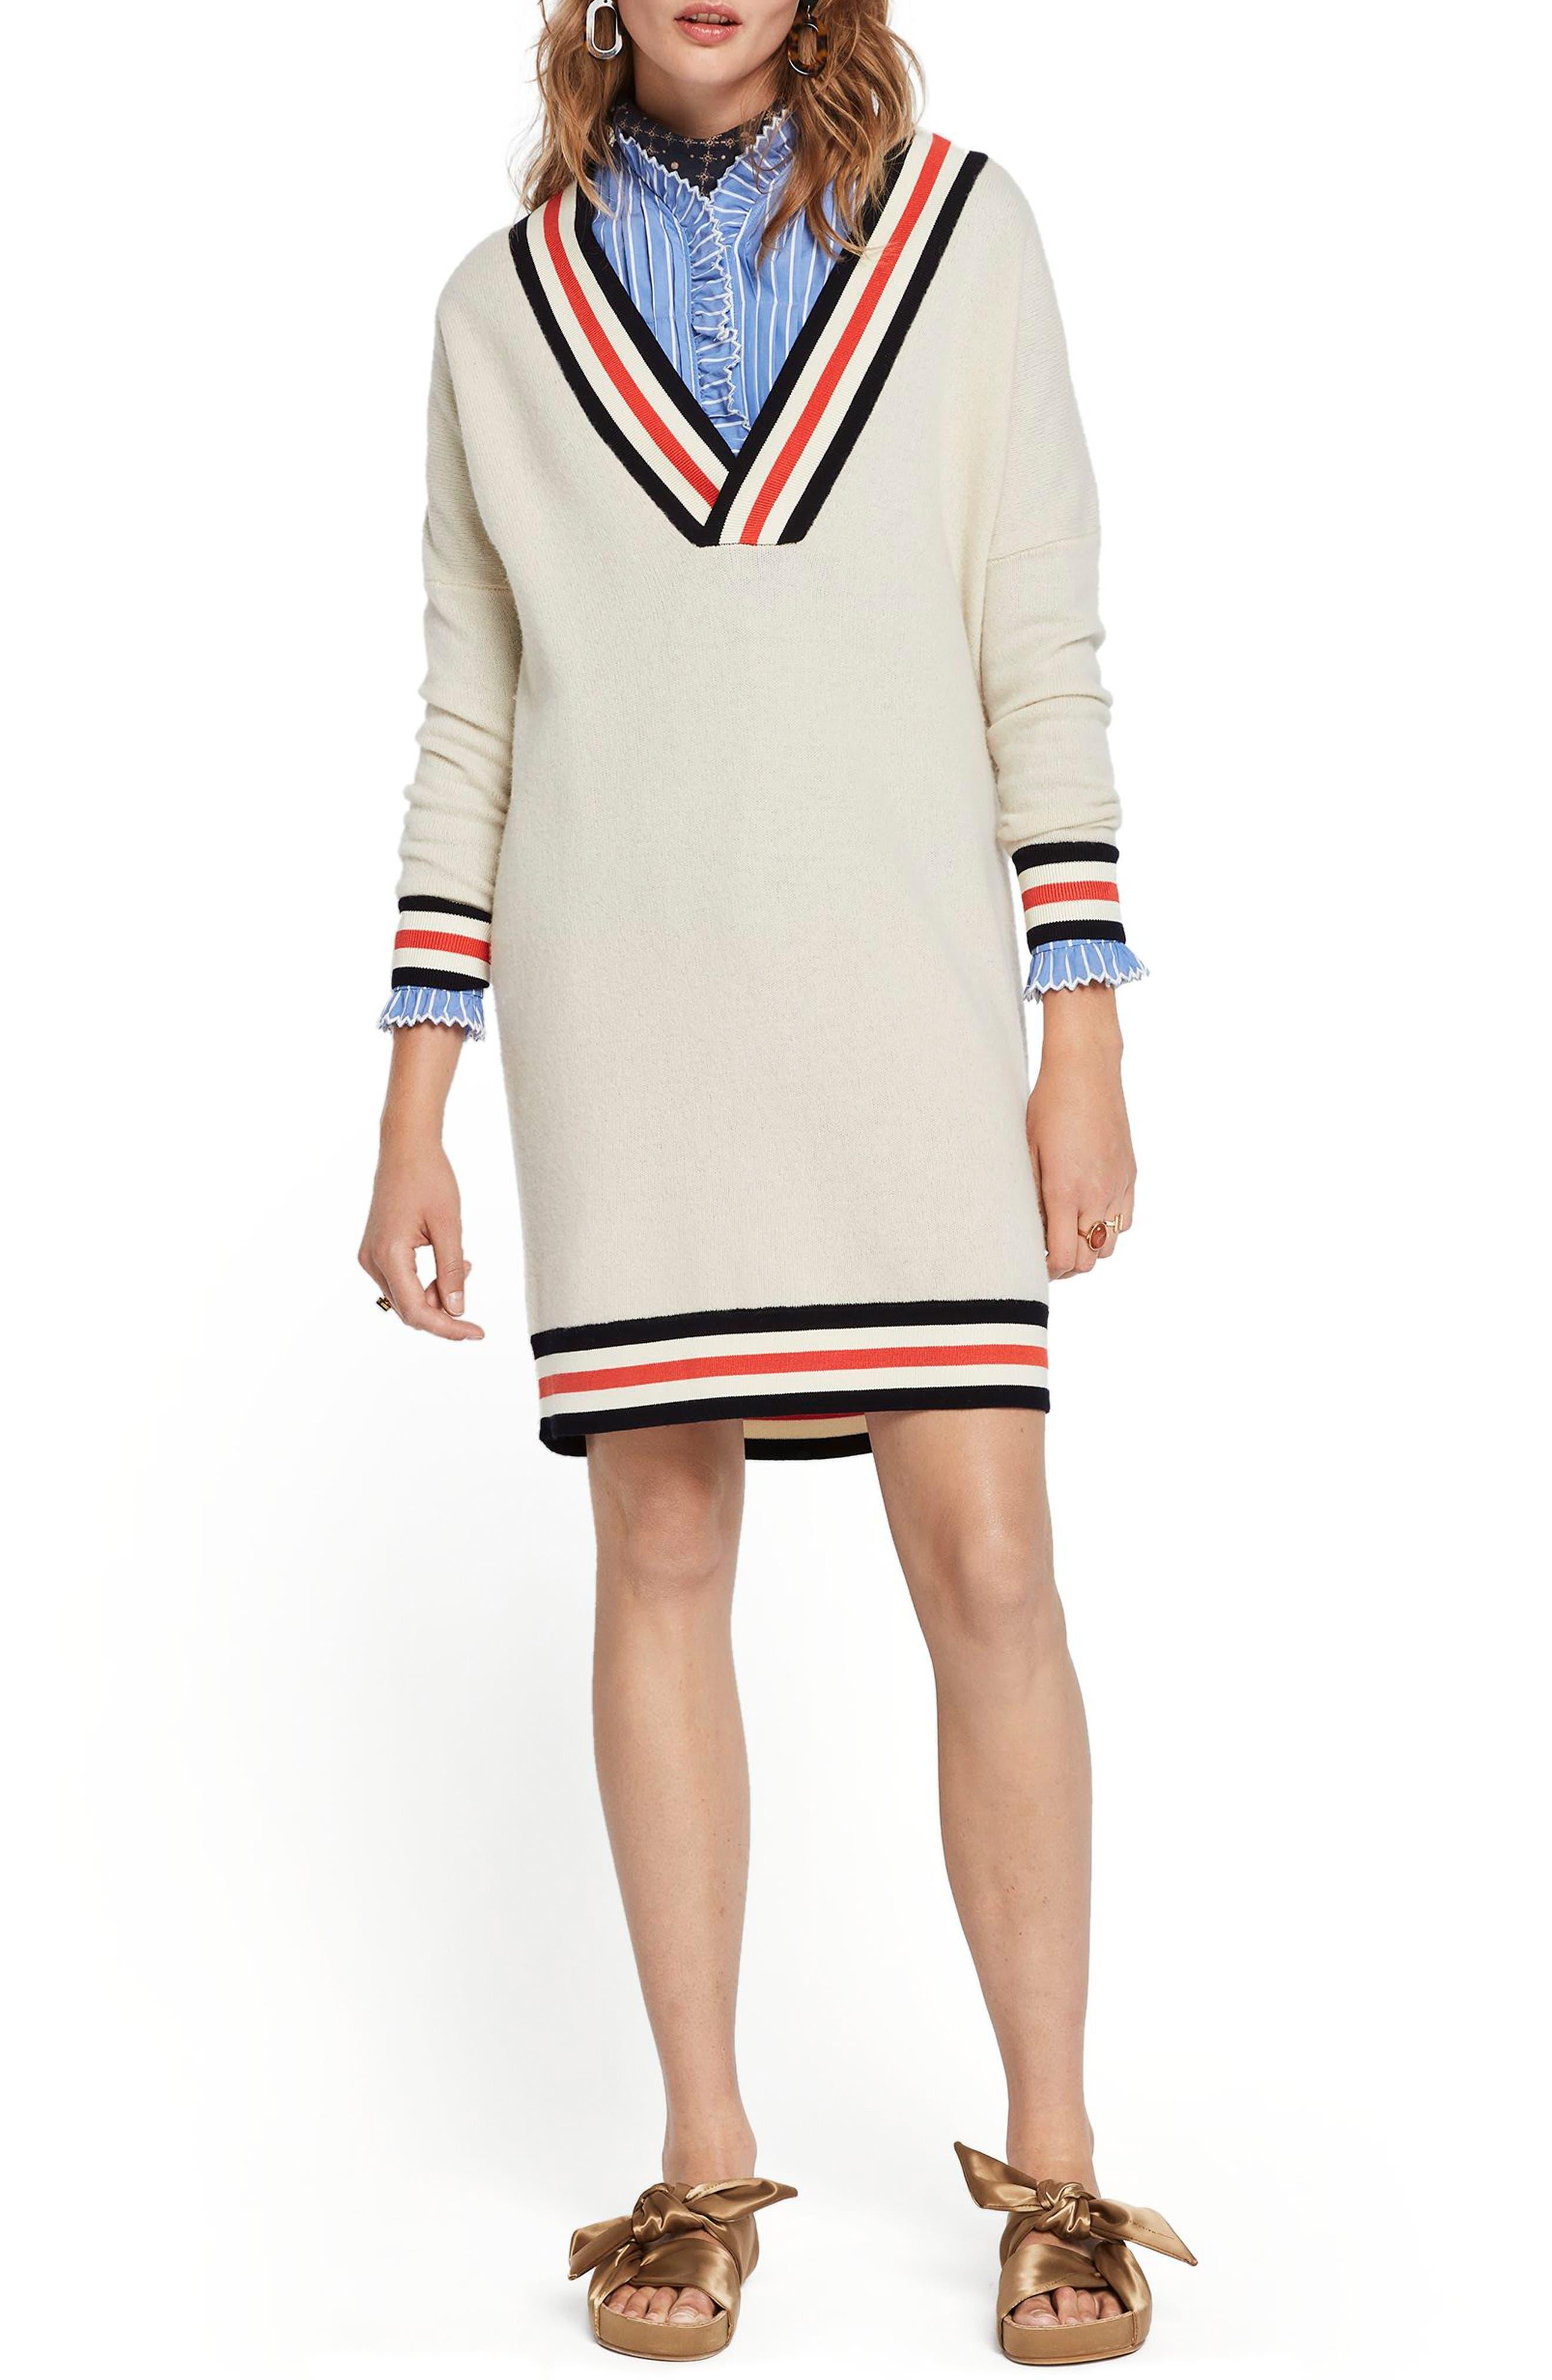 SCOTCH & SODA, Luxury Lambswool Longline Sweater, Main thumbnail 1, color, 250